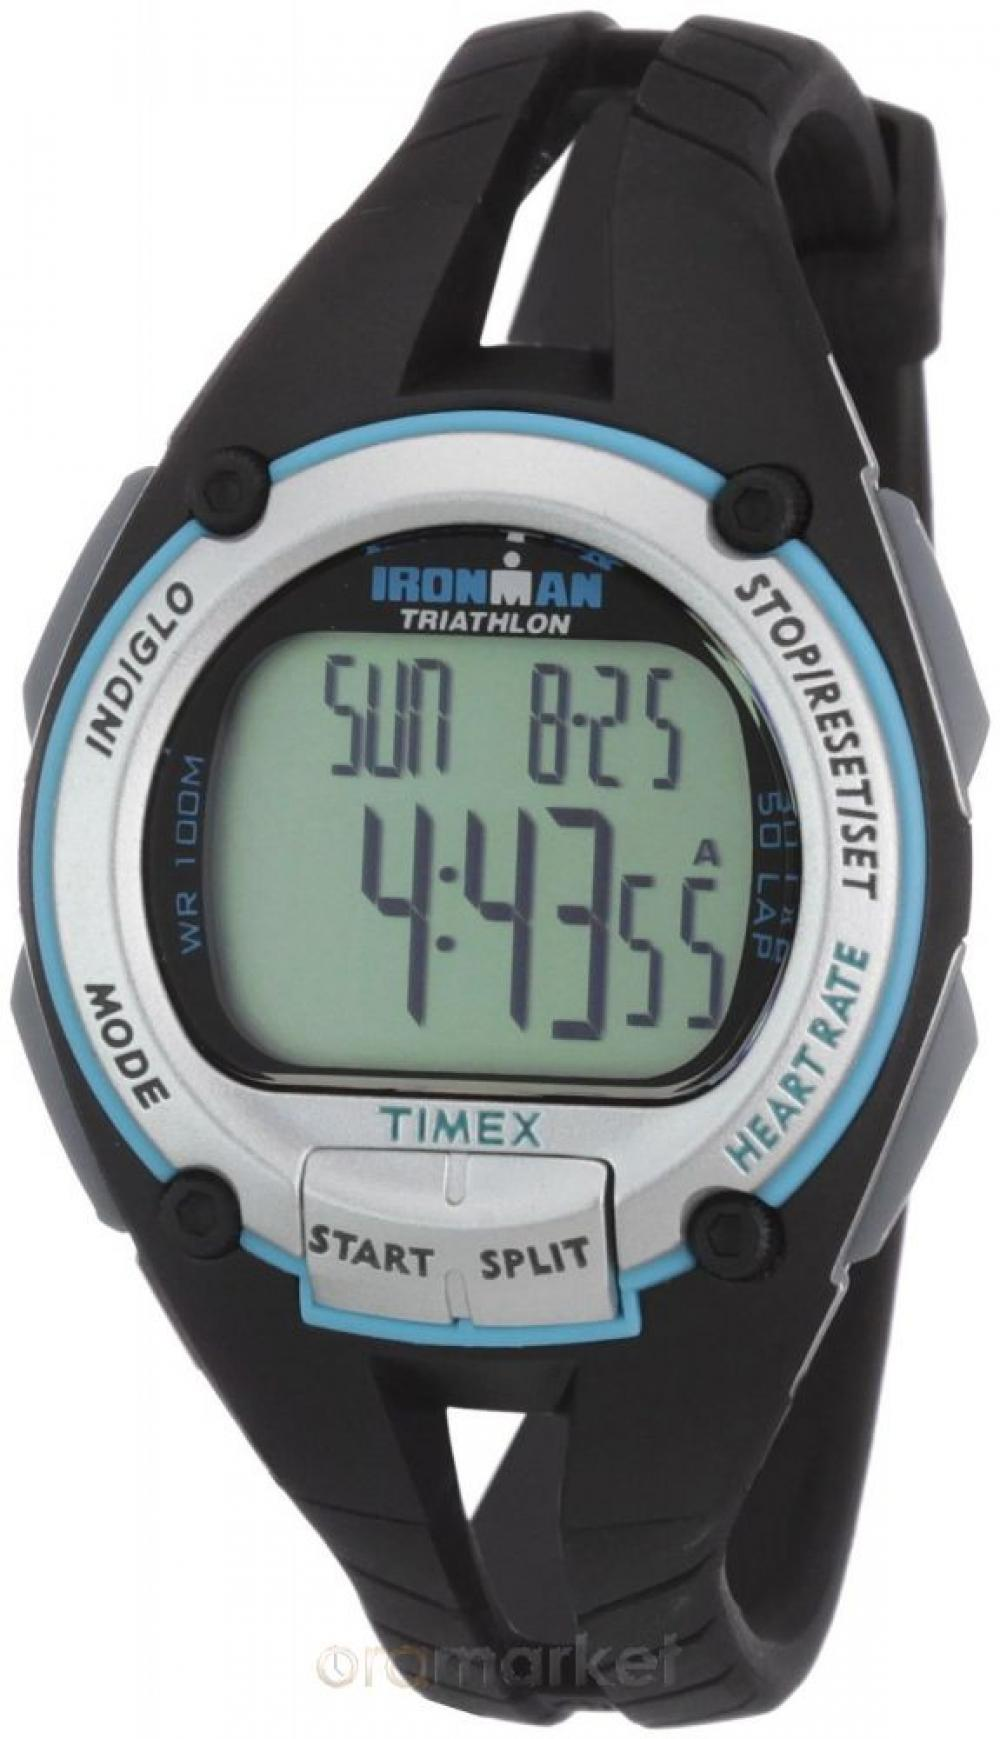 9323f4eb8834 Spuri Futóbolt - akciós Timex pulzusmérős órák - Futanet.hu